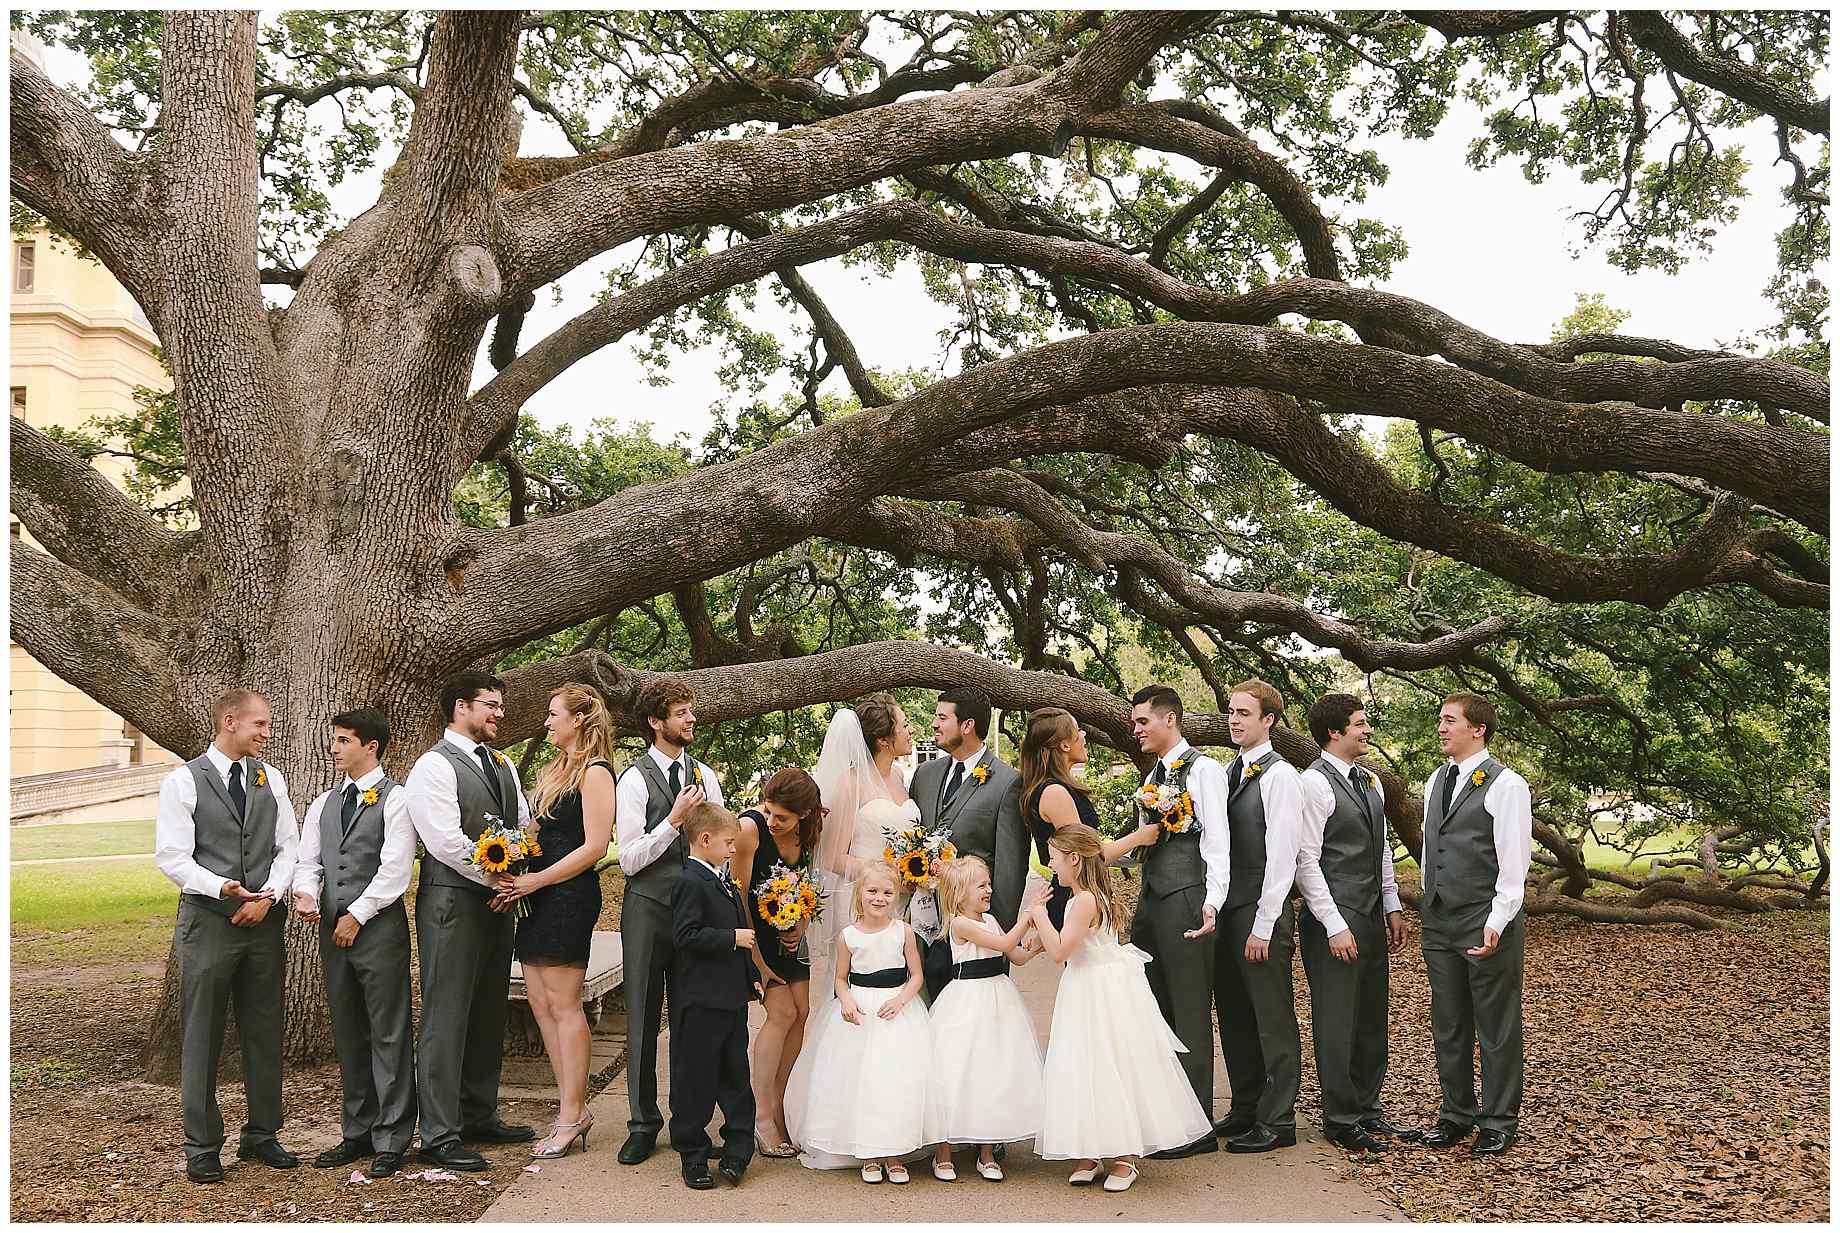 aggie-century-tree-wedding-20